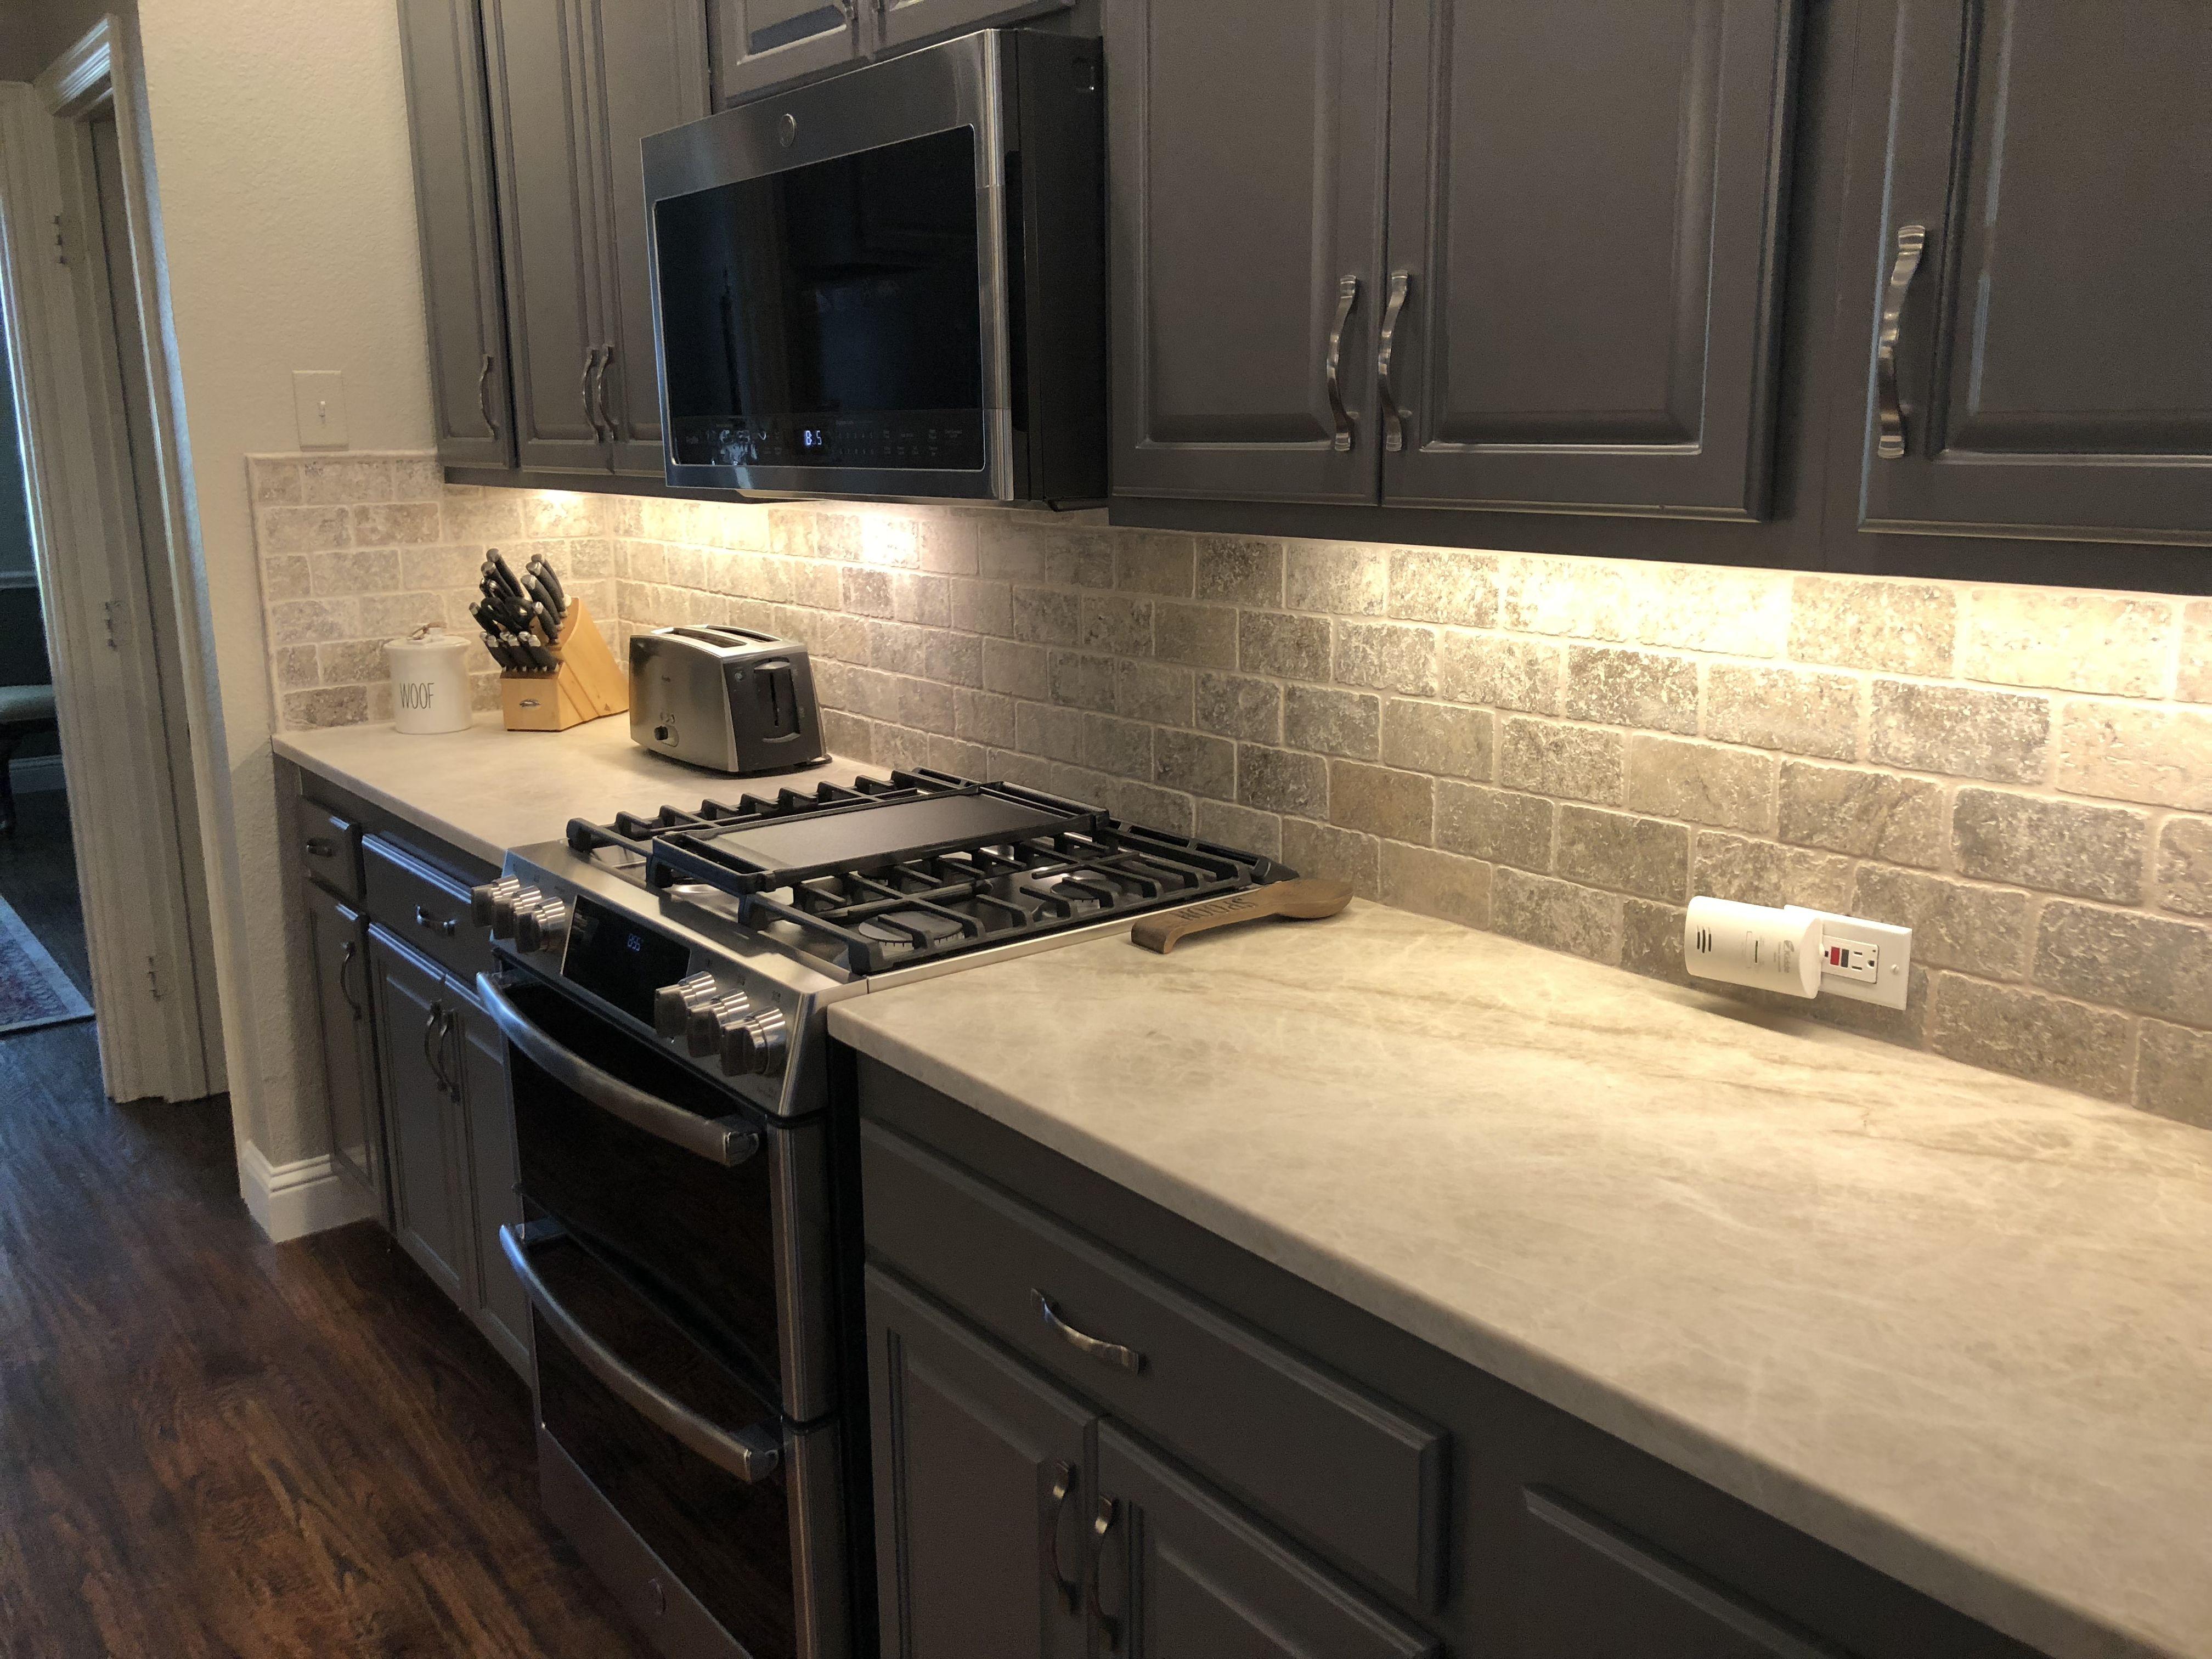 - Taj Mahal Quartzite - Leathered Finished; Cabinets - Valspar Rugged Suede  (color Matched B… Kitchen Backsplash Designs, Travertine Backsplash, Taj  Mahal Quartzite